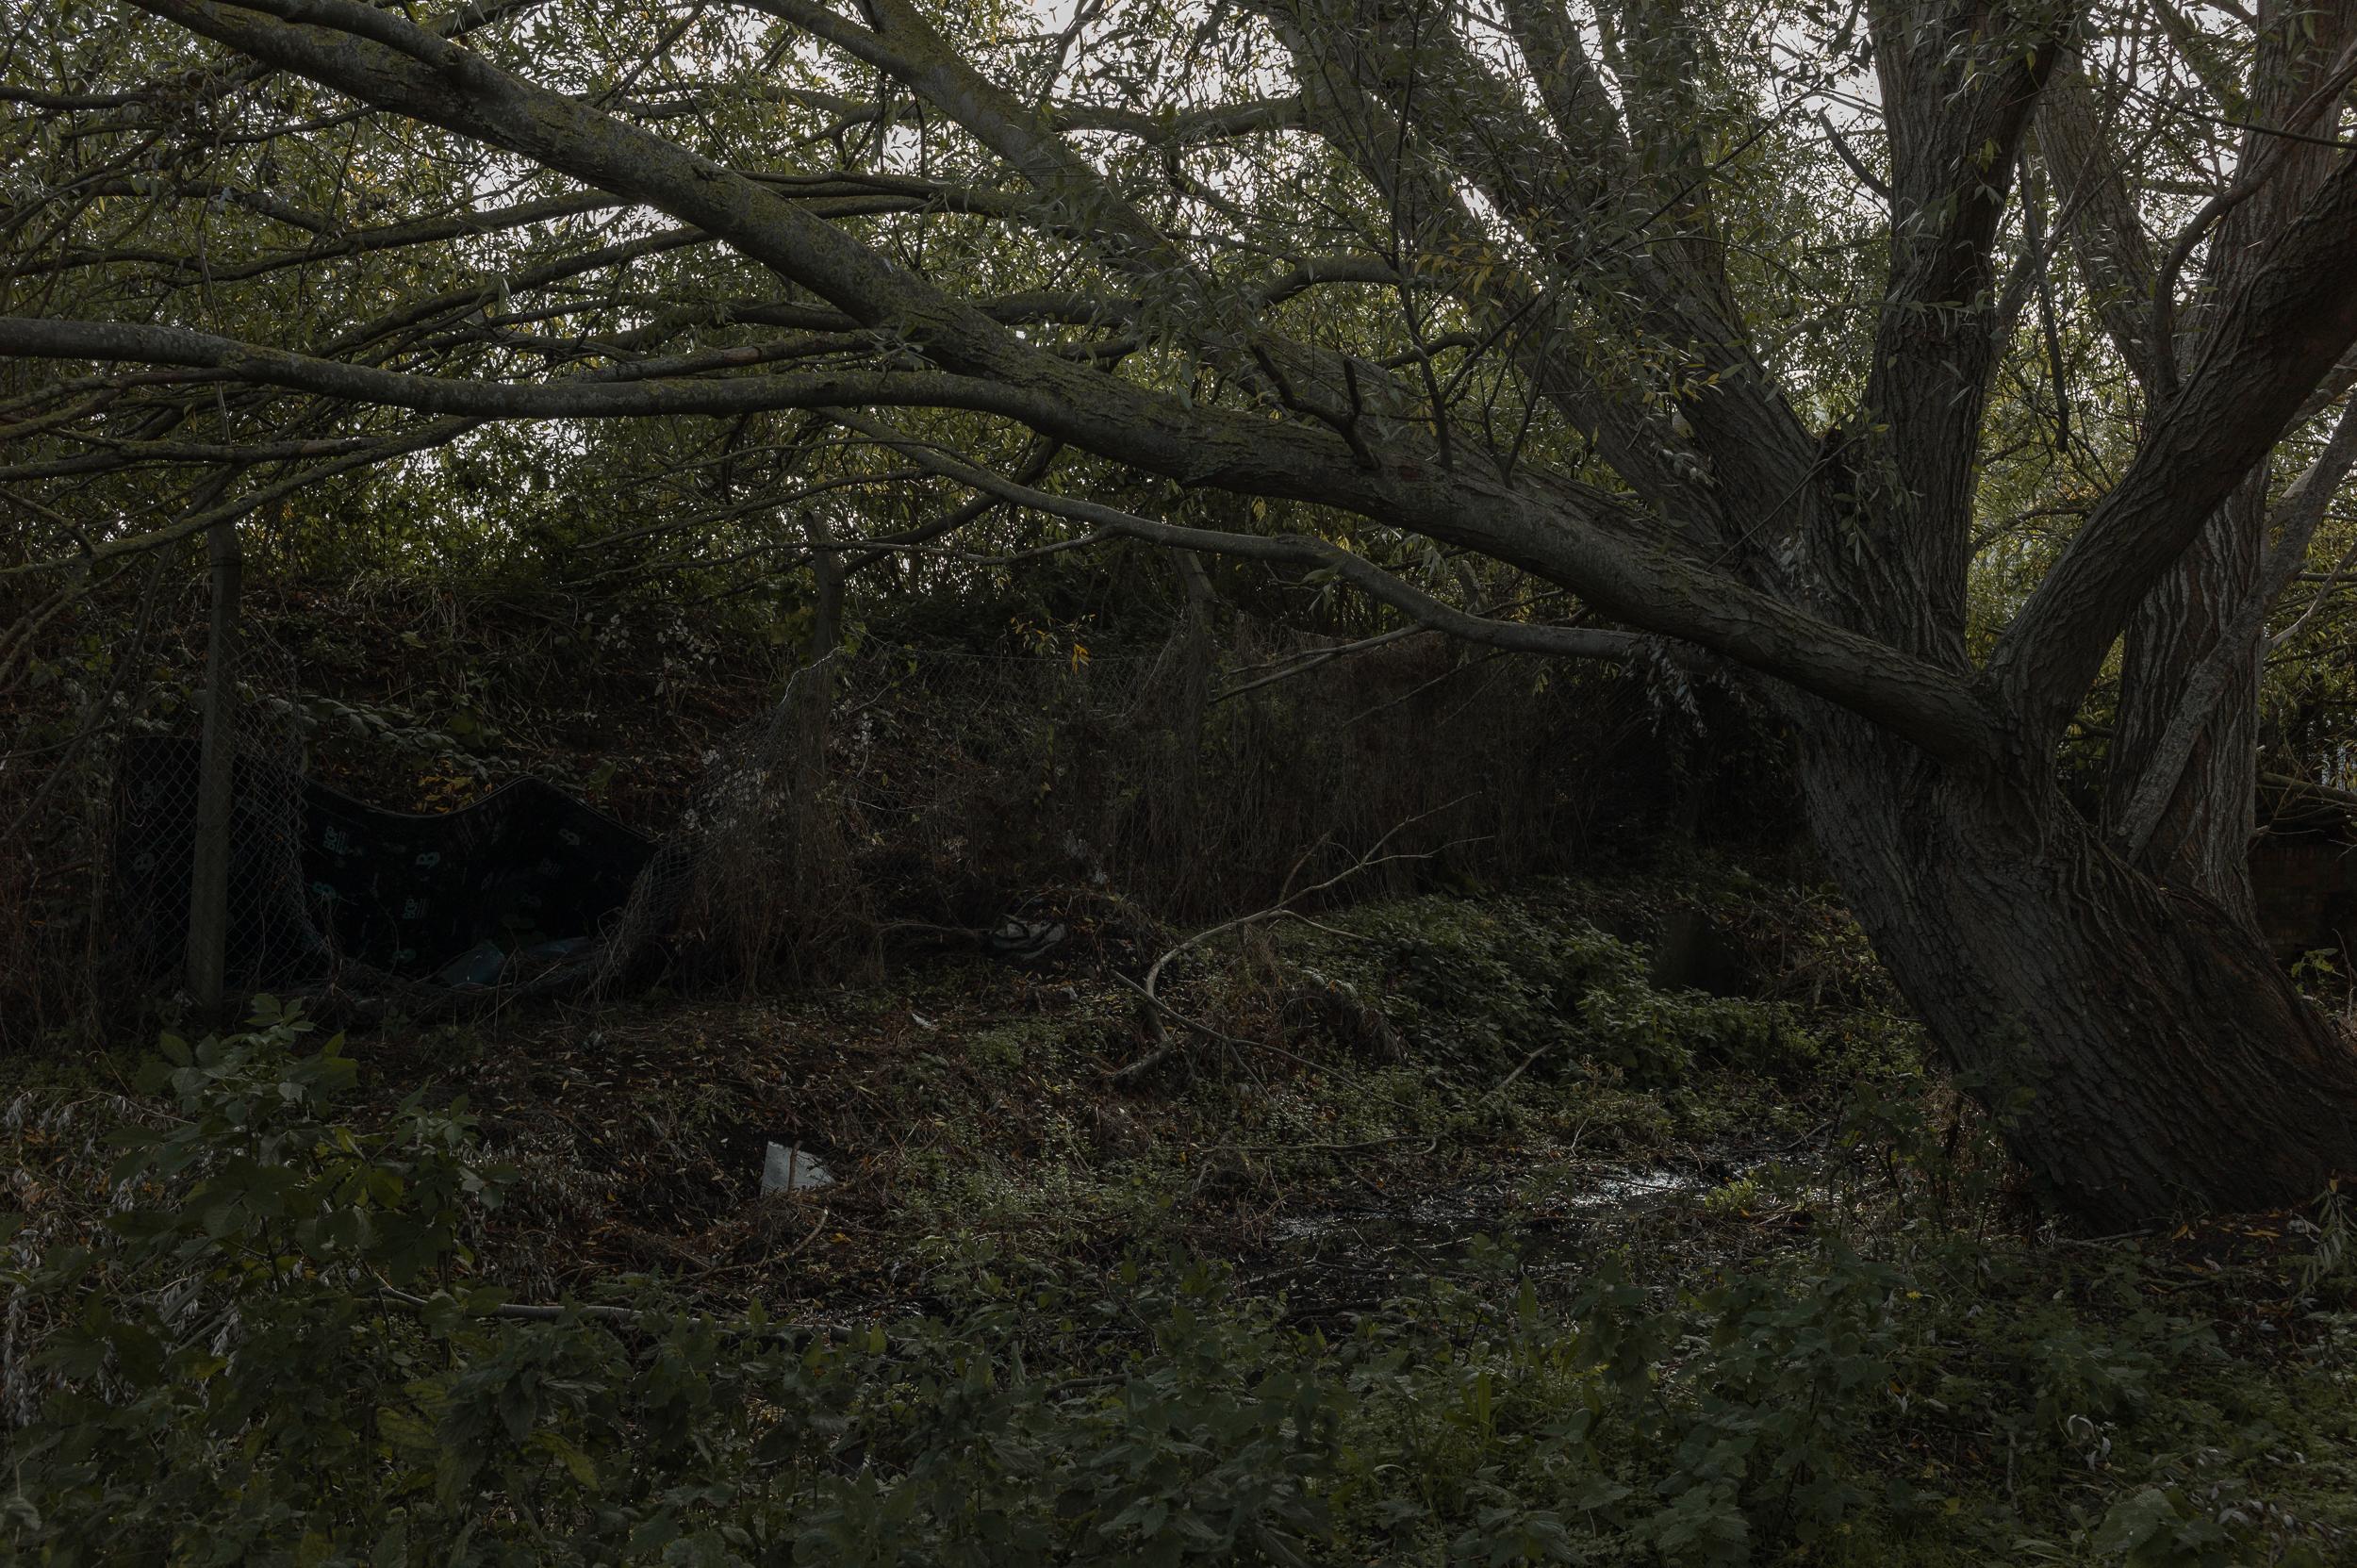 Newhaven-L1012193.jpg